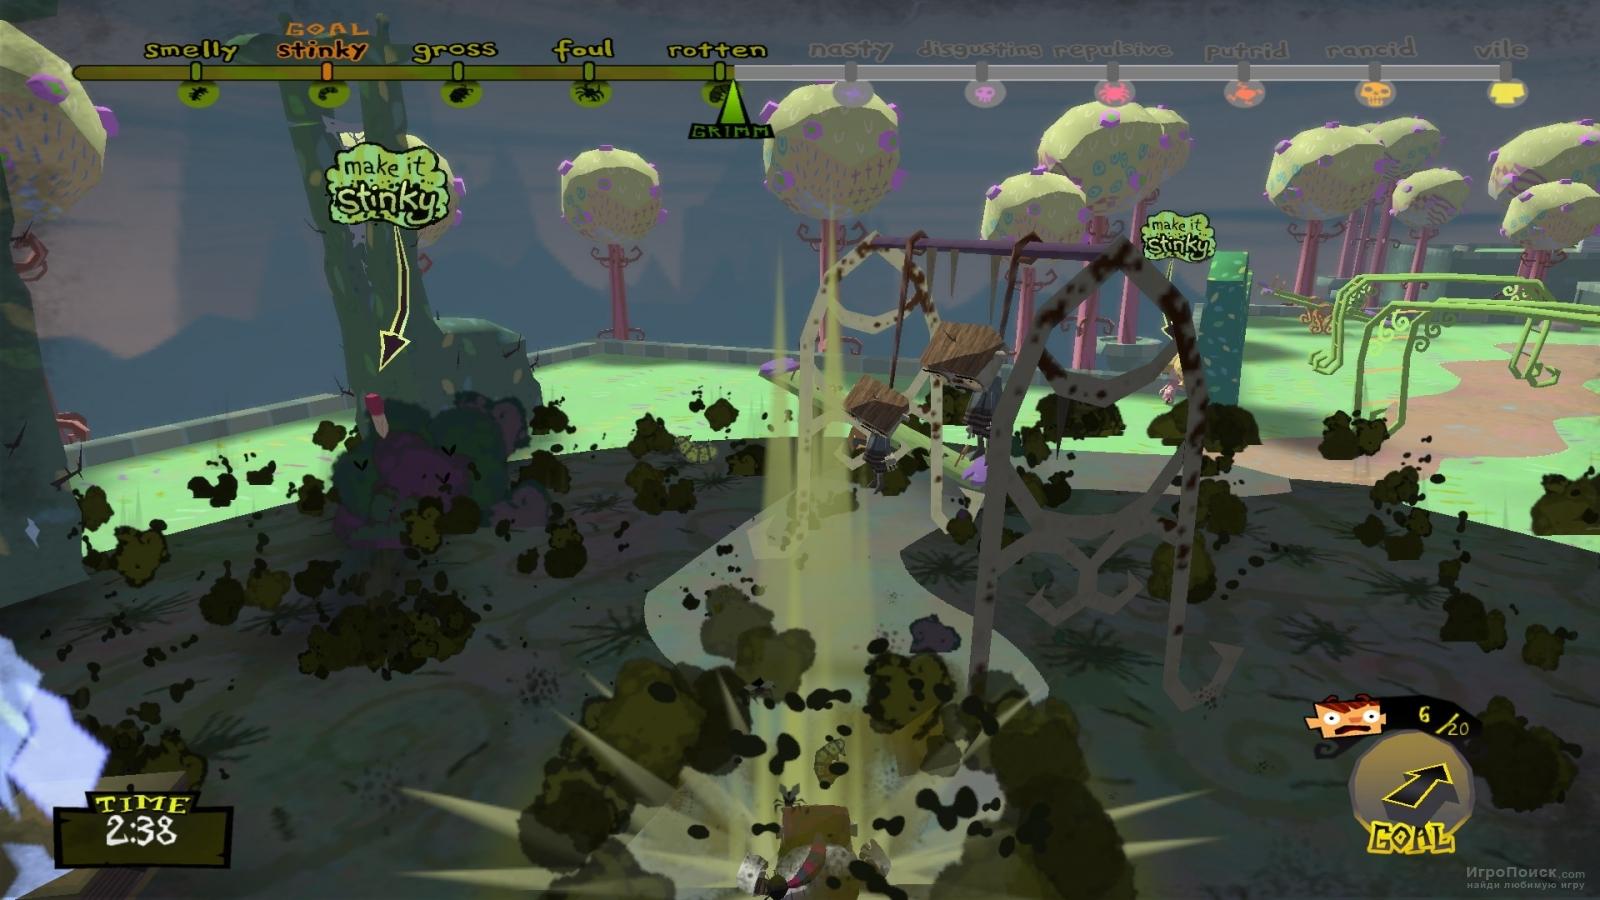 Скриншот к игре American Mcgee's Grimm: Season One